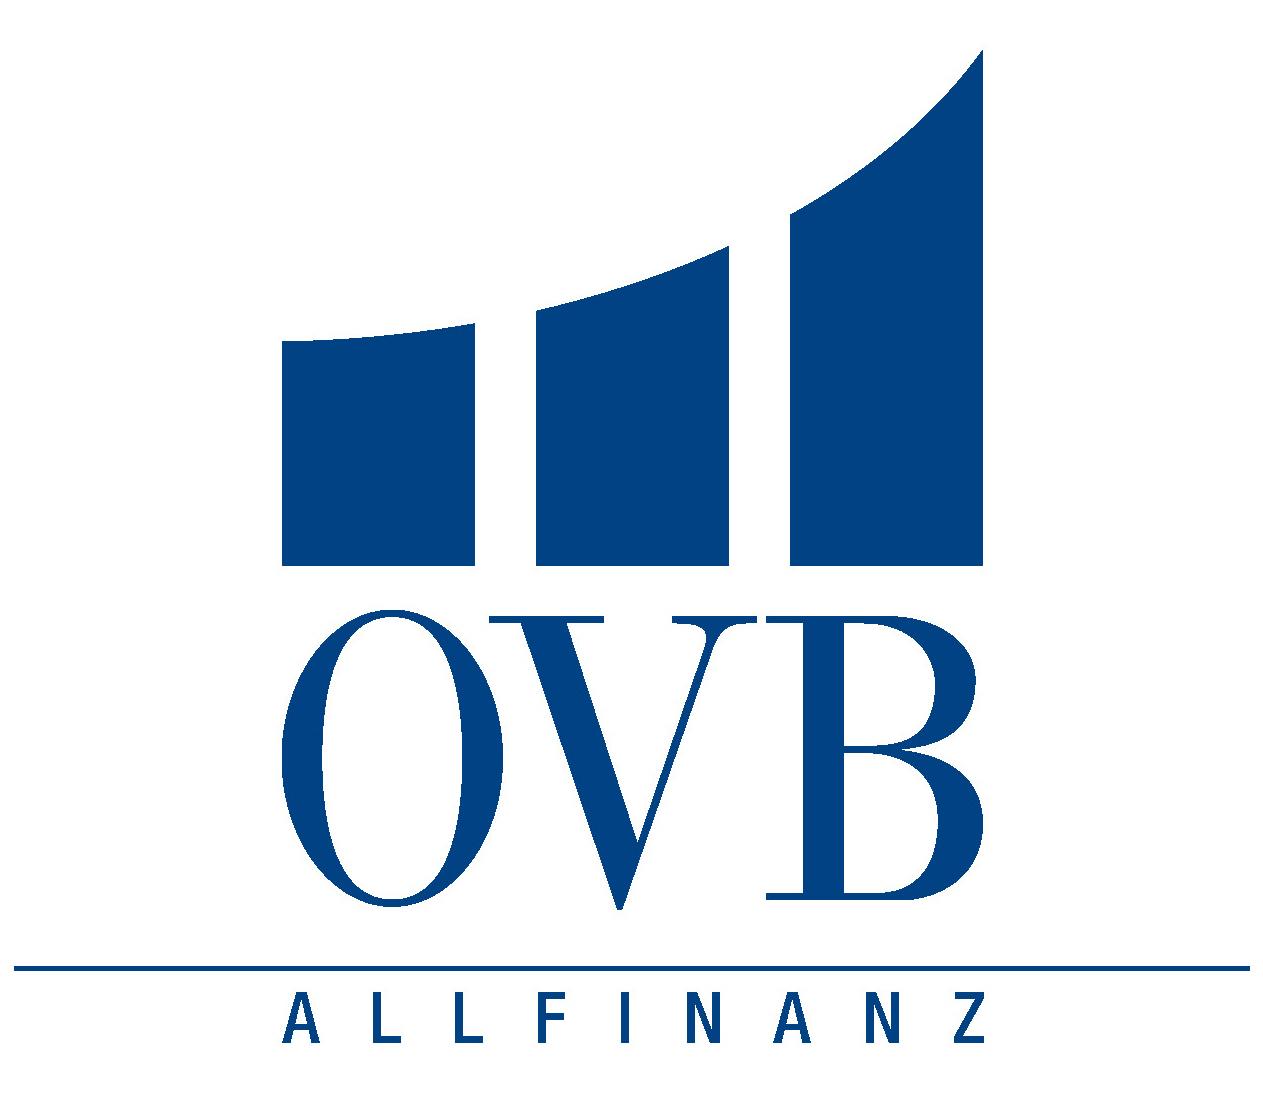 OVB Allfinanz sigue creciendo en España en 2013